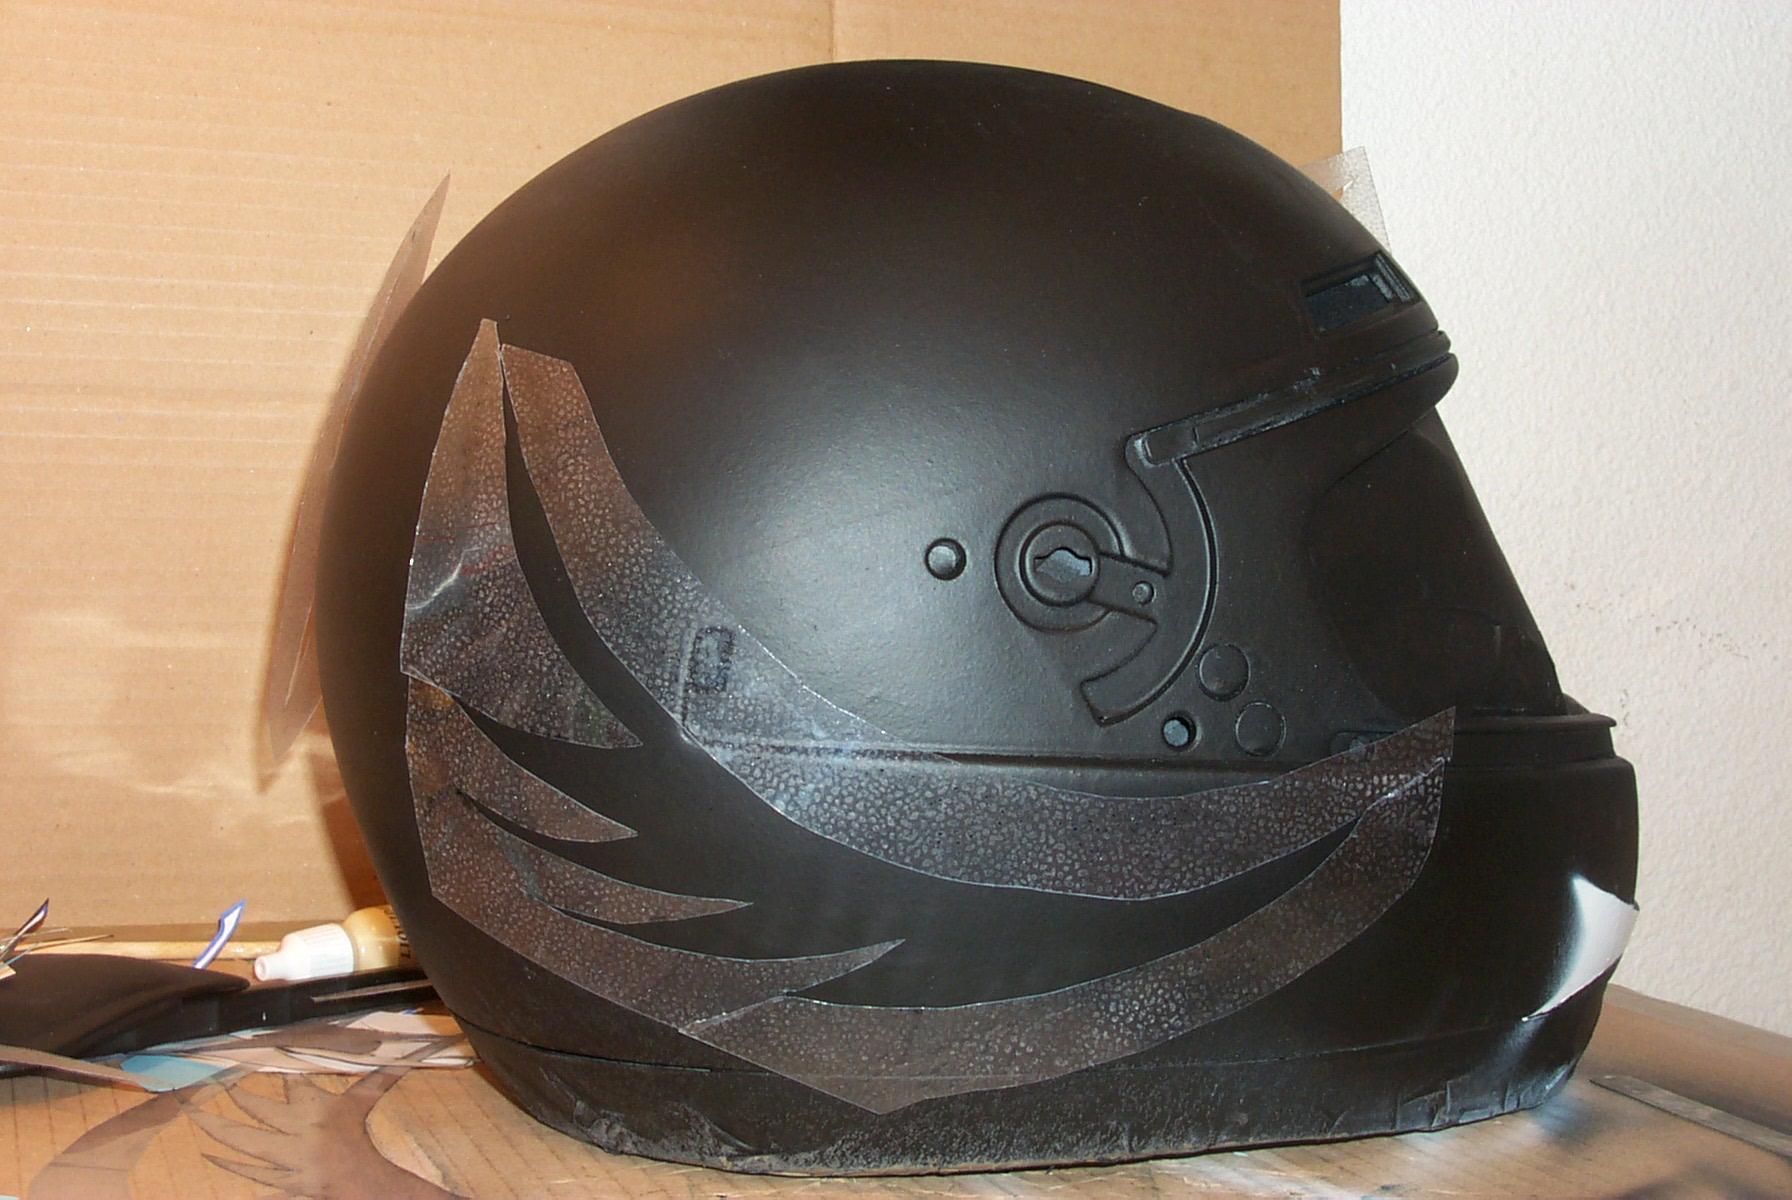 Tuning casque de moto les cr ations de sorsha - Temps de sechage peinture auto avant vernis ...